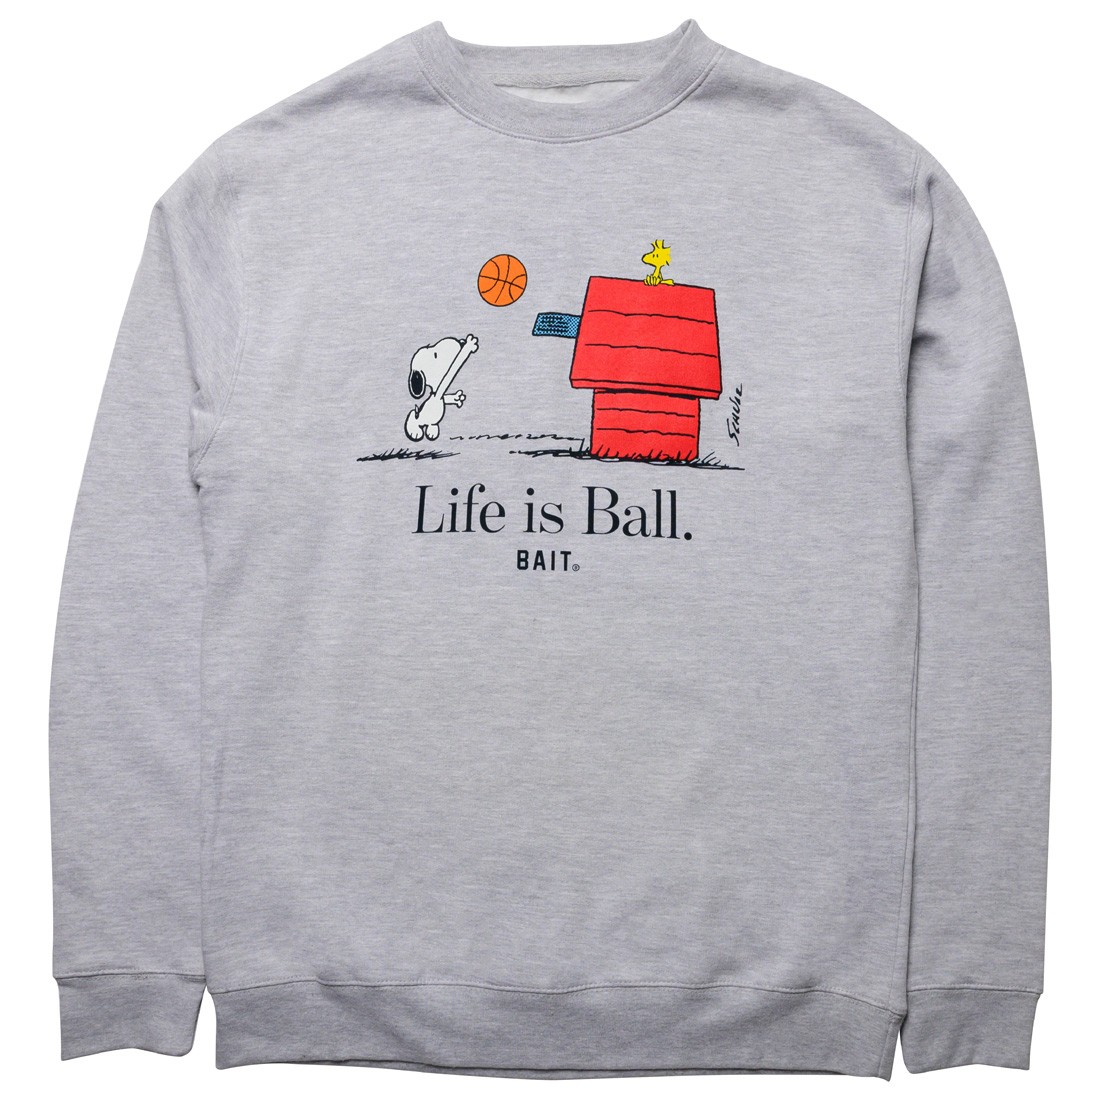 BAIT x Snoopy Men Life Ball Crewneck Sweater (gray / heather)